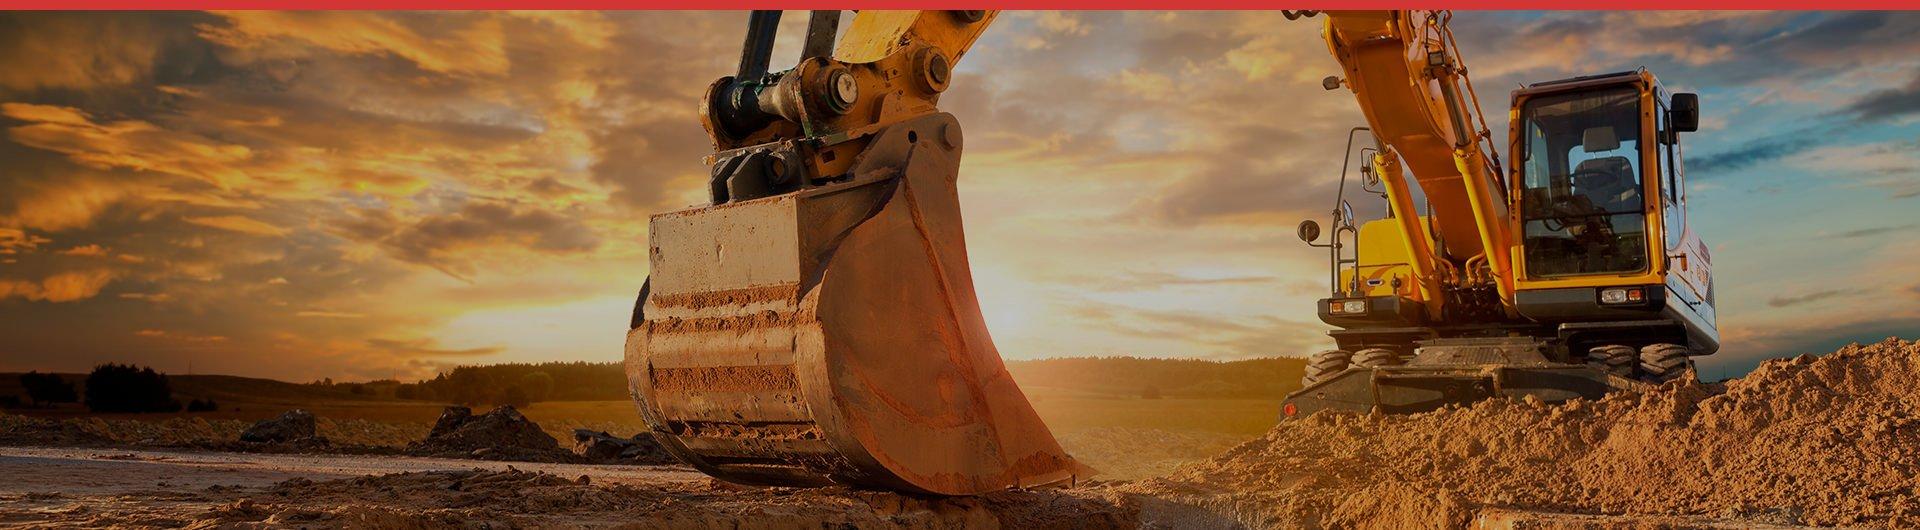 Mining_LP_Banner.jpg